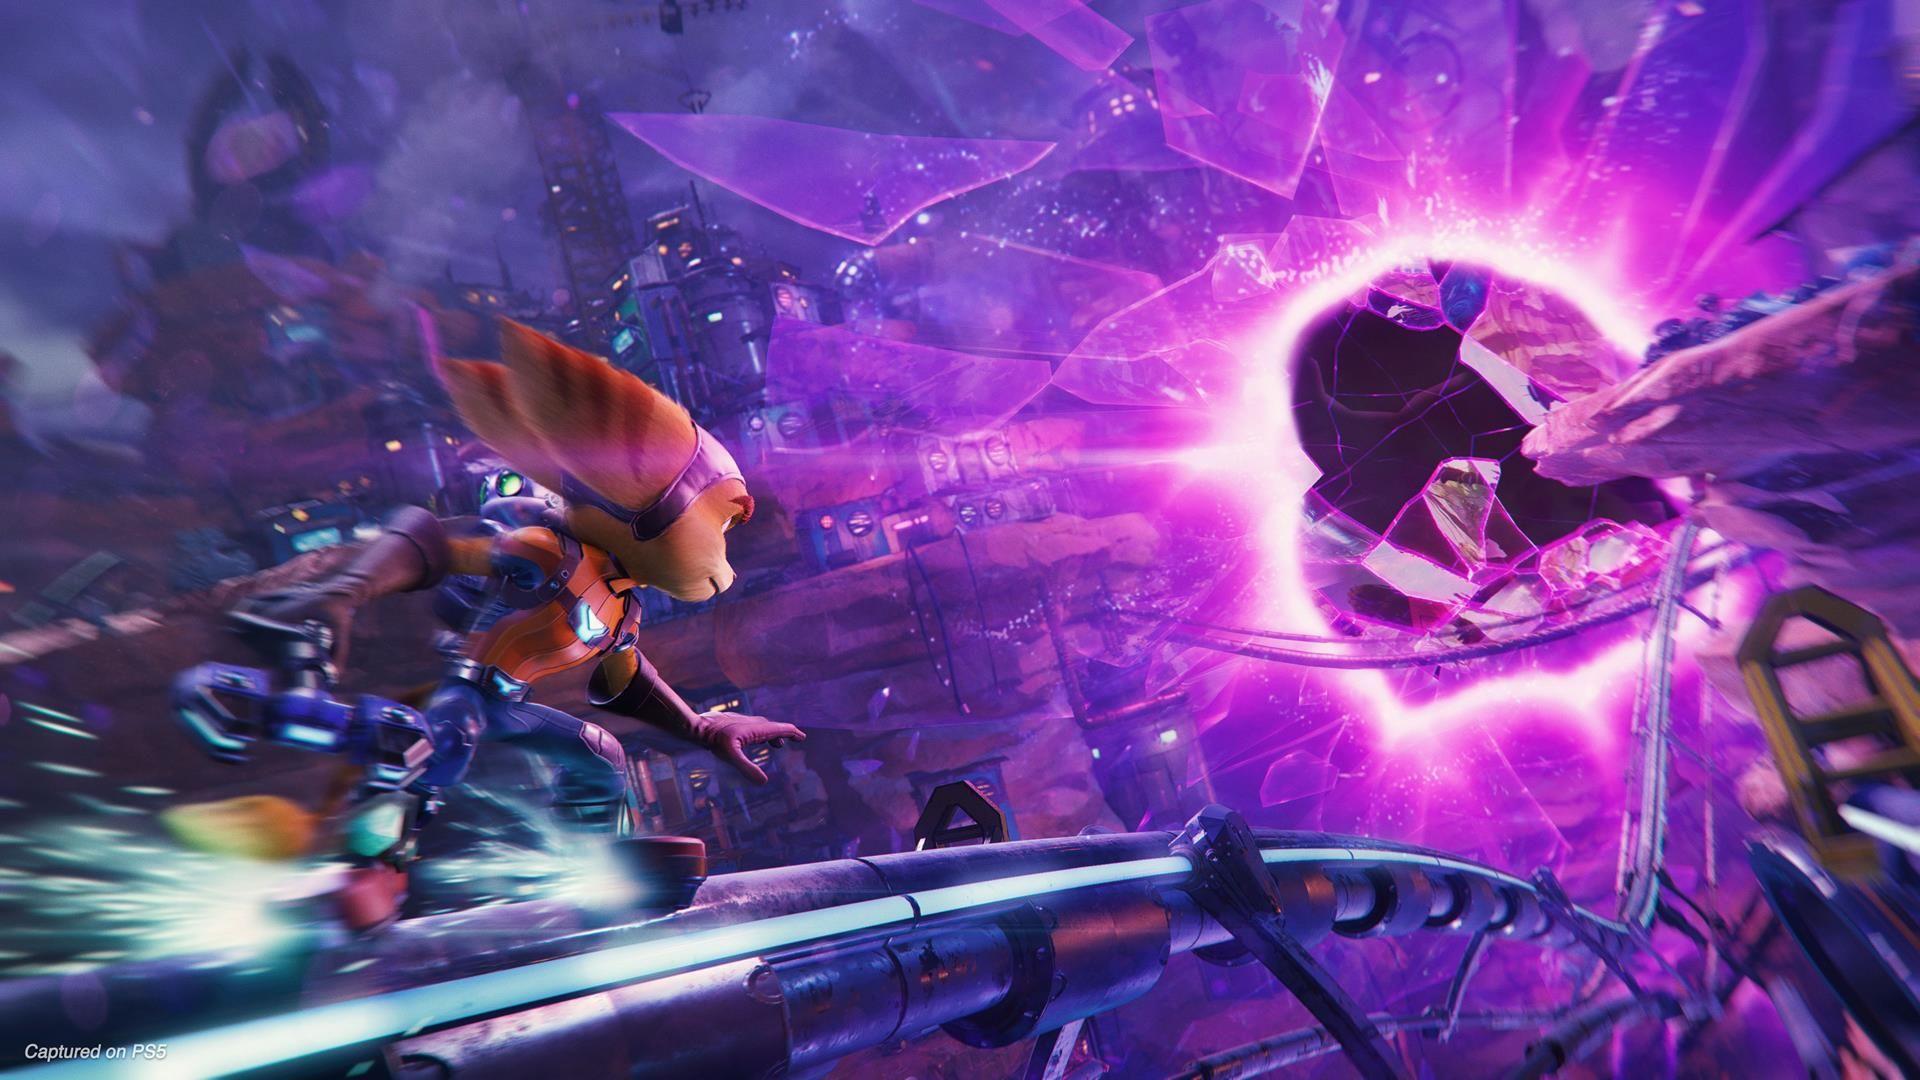 Ratchet & Clank: Rift Apart'ın yeni oynanış videosu yayınlandı